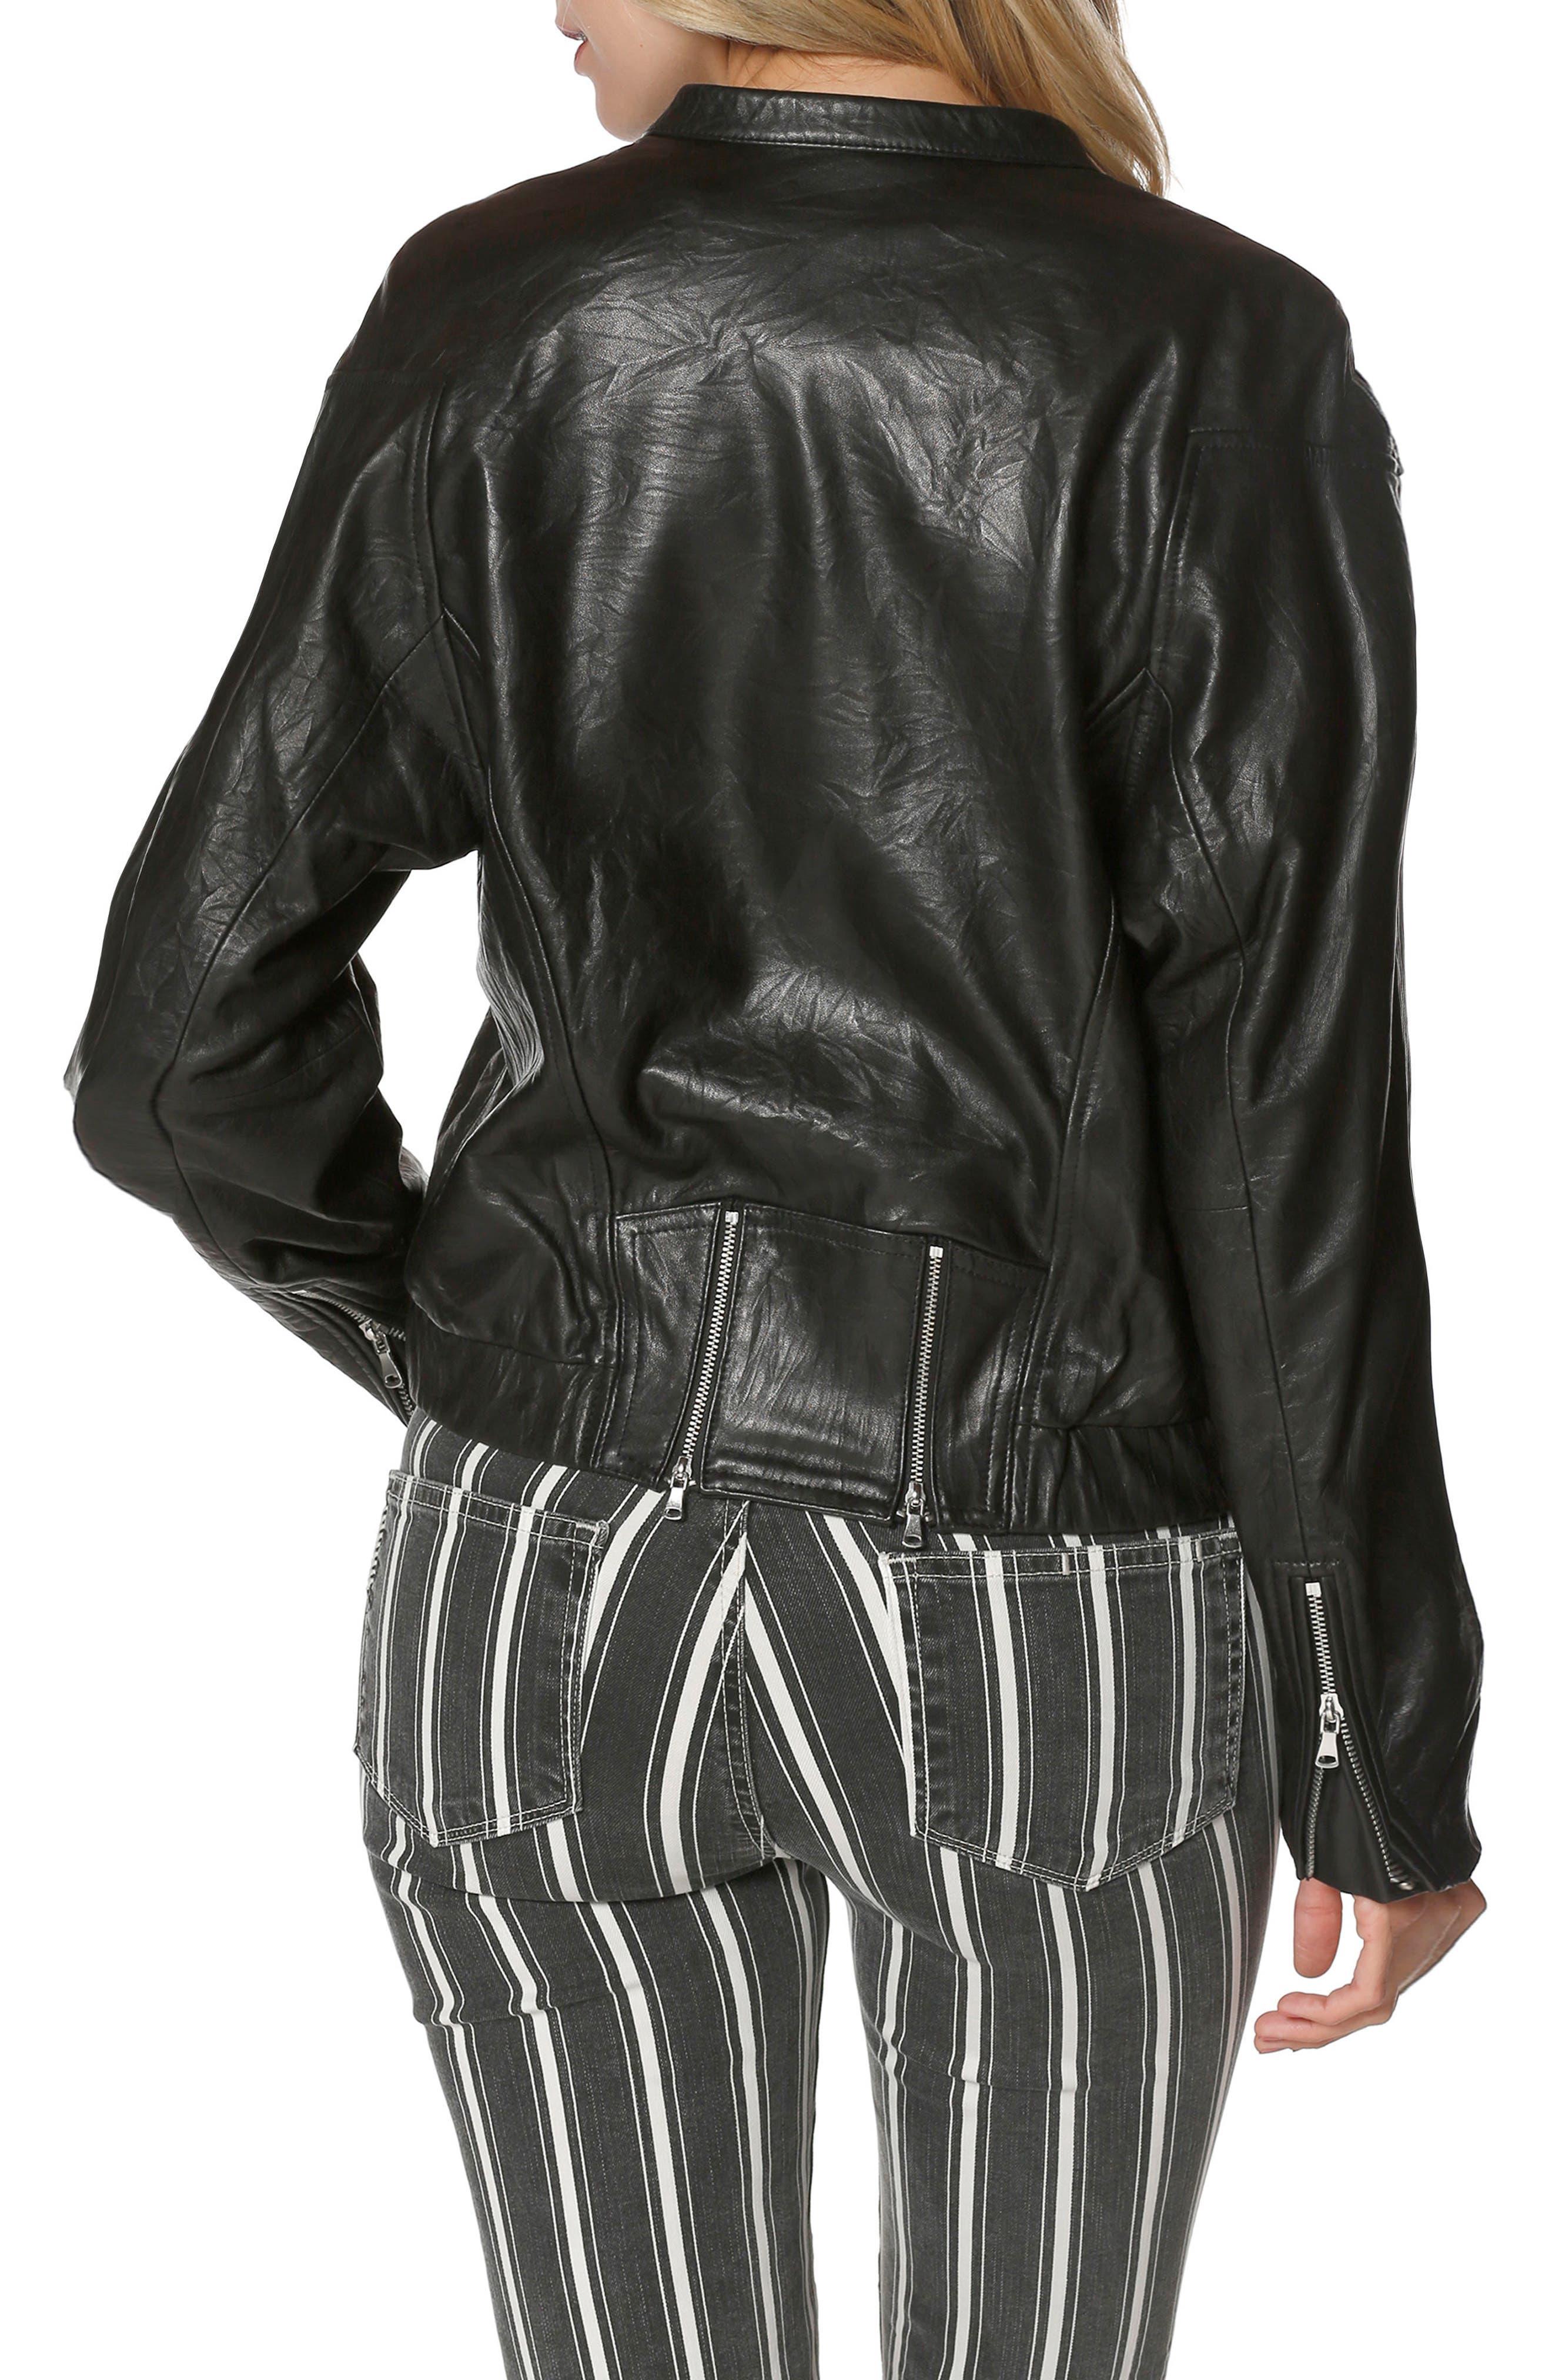 Giana Leather Moto Jacket,                             Alternate thumbnail 2, color,                             Black